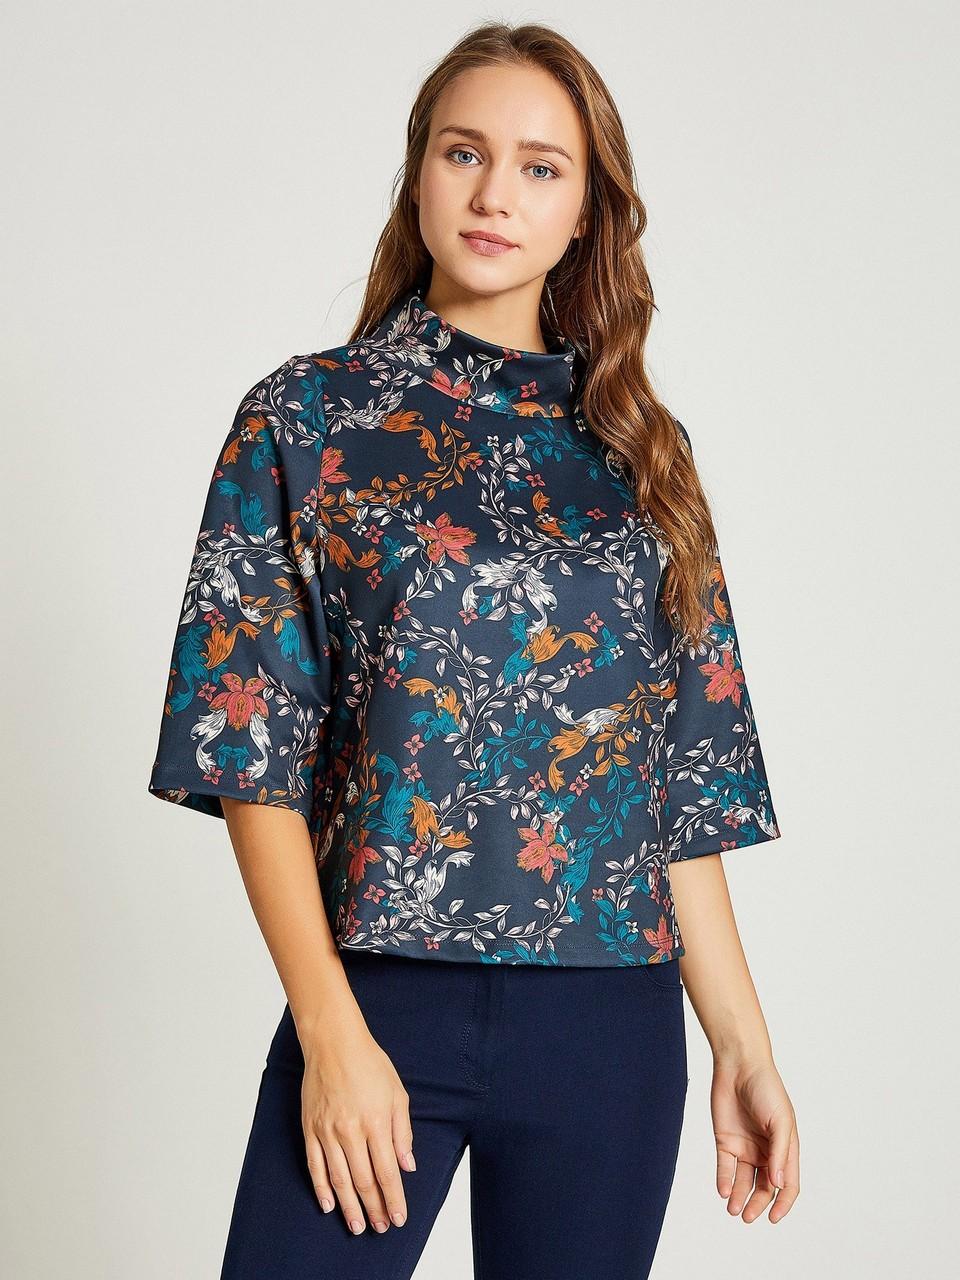 Floral Patterned Sweatshirt